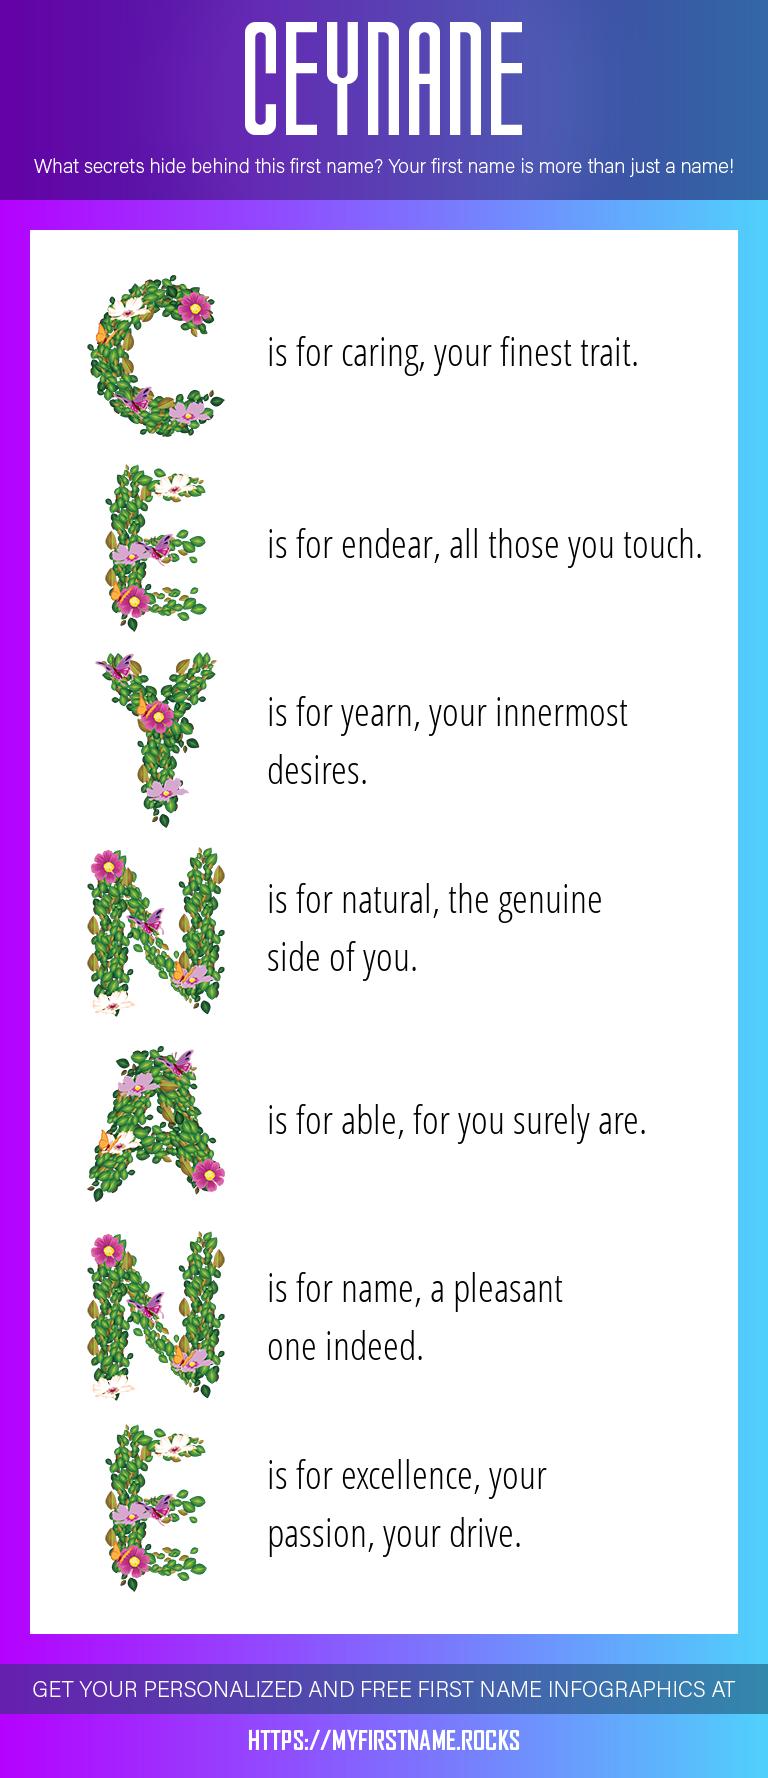 Ceynane Infographics